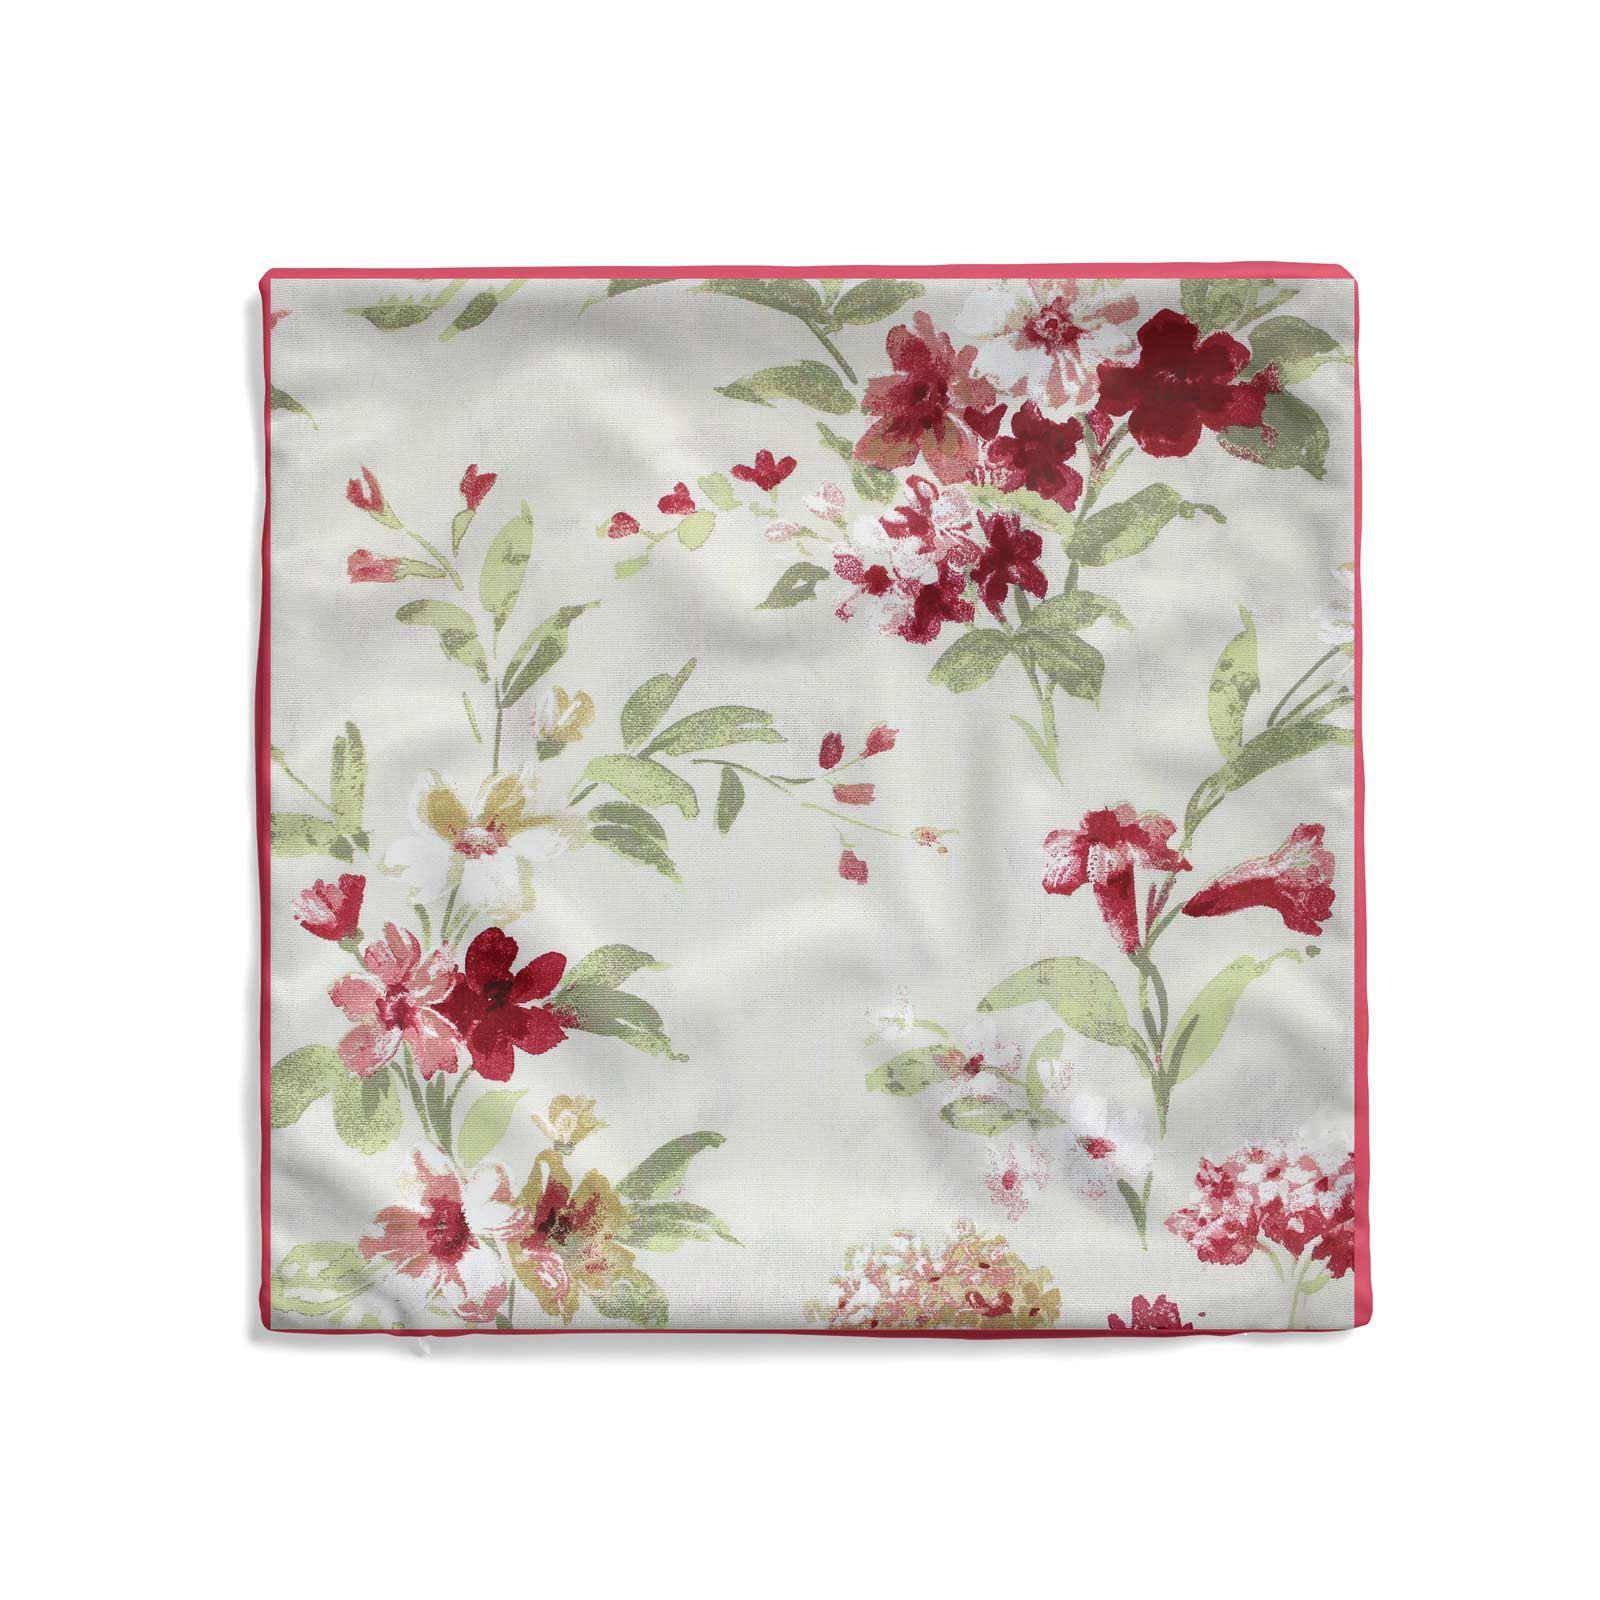 Vino-Tinto-Cushion-Covers-Coleccion-17-034-18-034-43cm-45cm-Cubierta miniatura 21